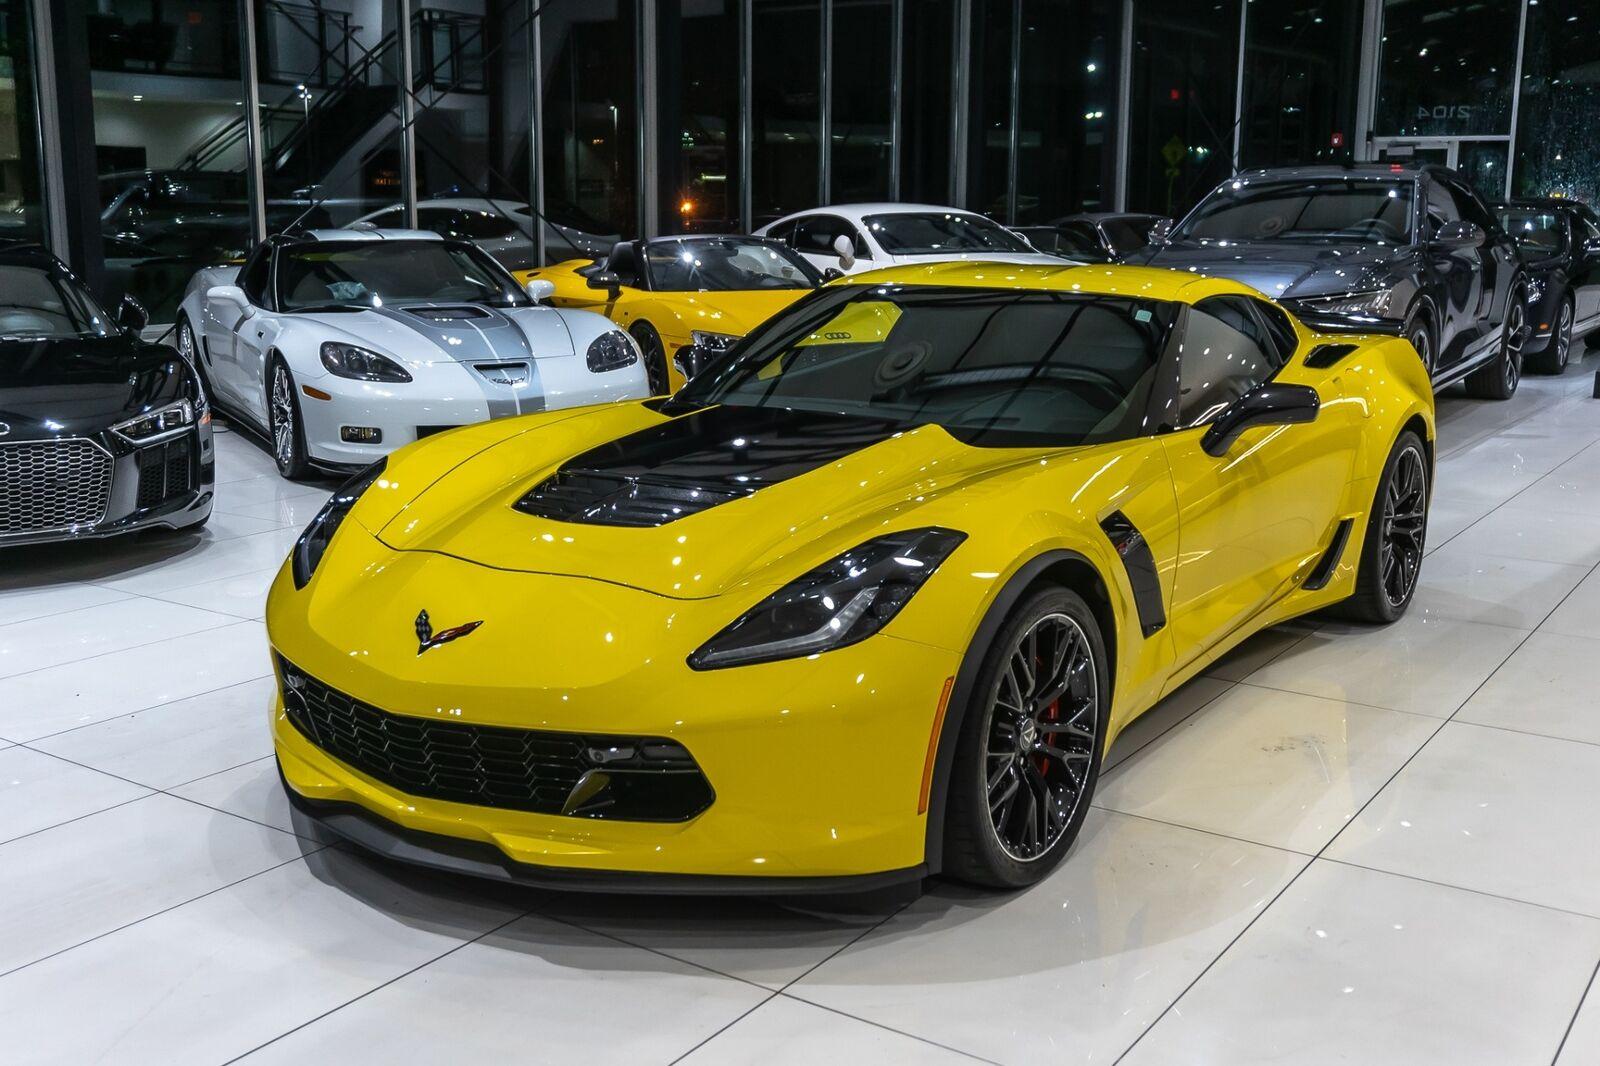 2016 Yellow Chevrolet Corvette Coupe 2LZ   C7 Corvette Photo 9